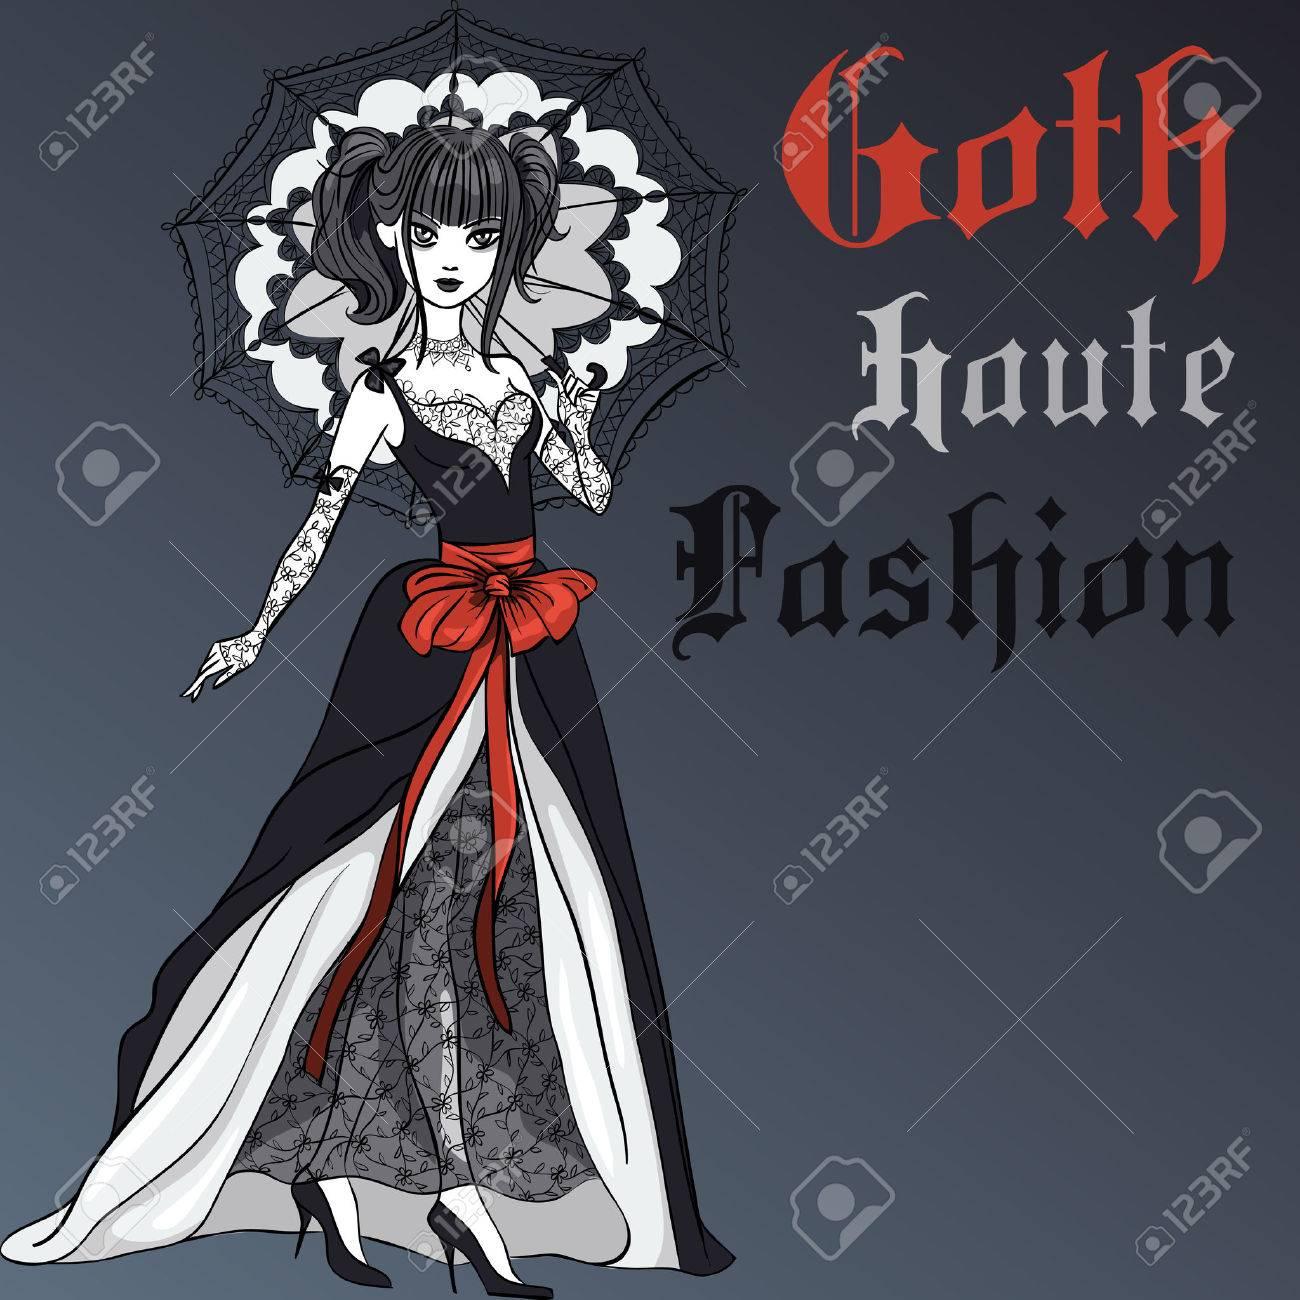 Victorian Gothic Graphic Design